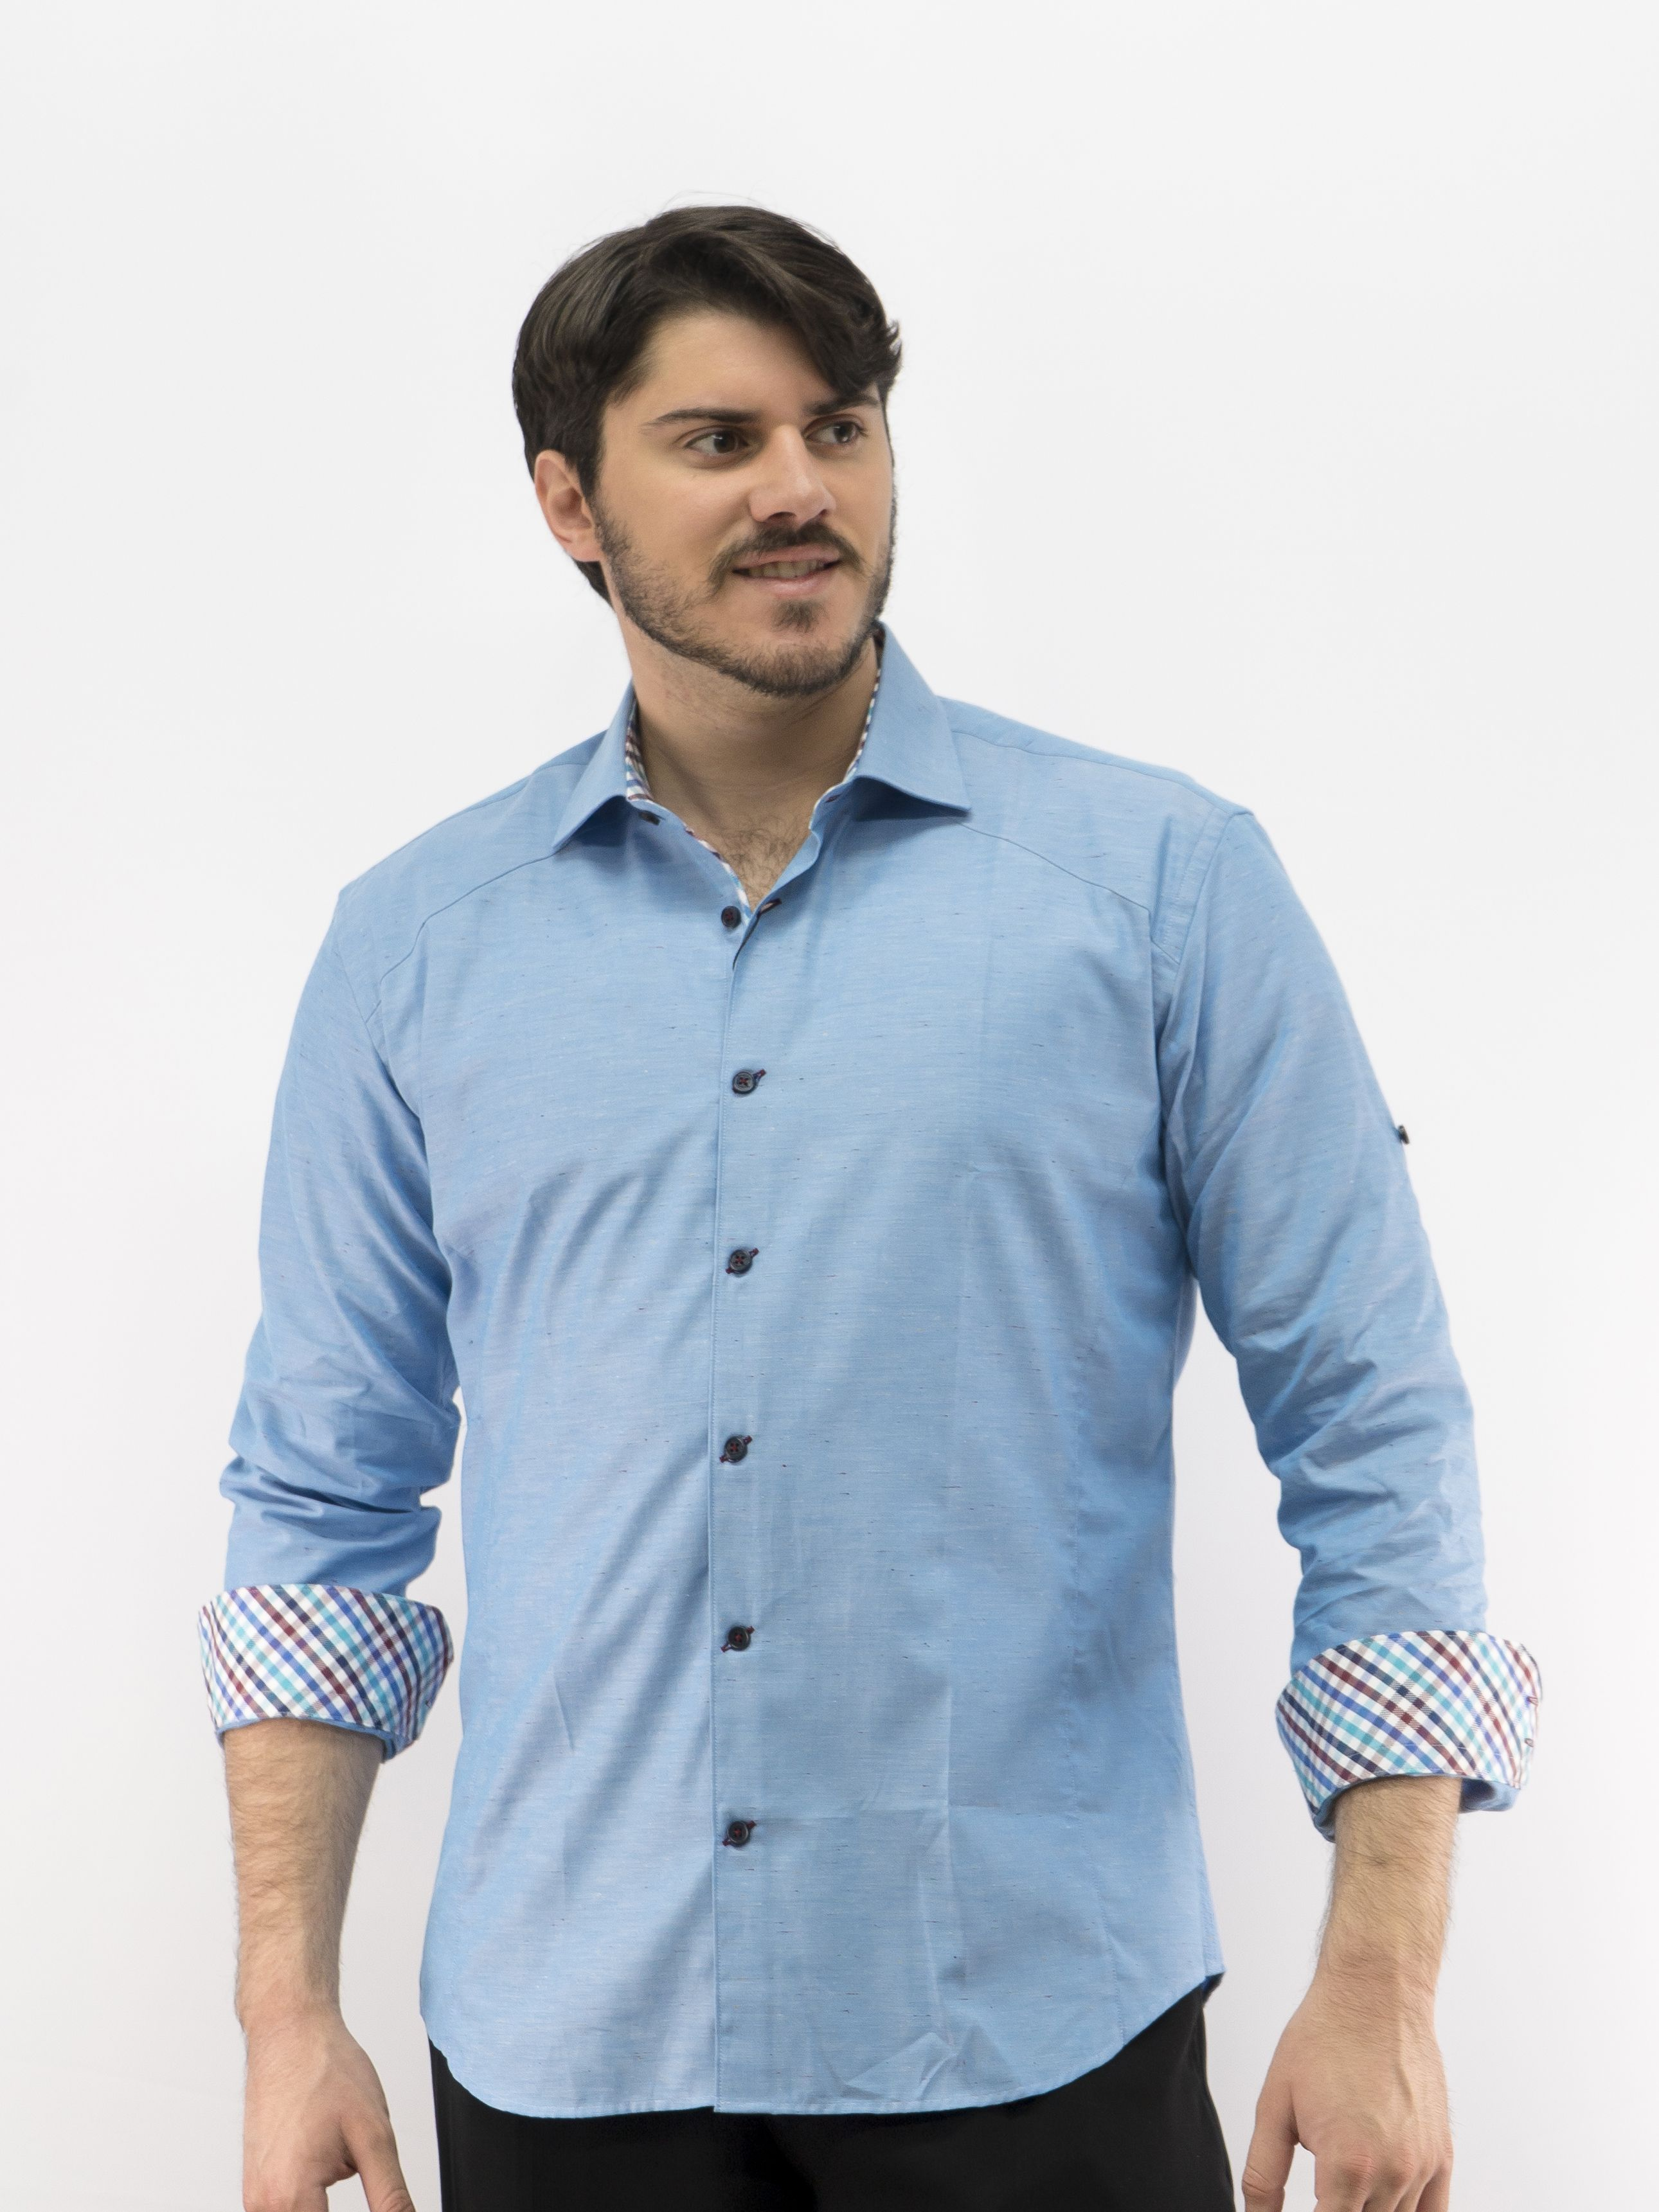 551cd7d1cc Men s Long Sleeve Dress Shirt Blue 100% Premium Cotton D Accord 4480 ...